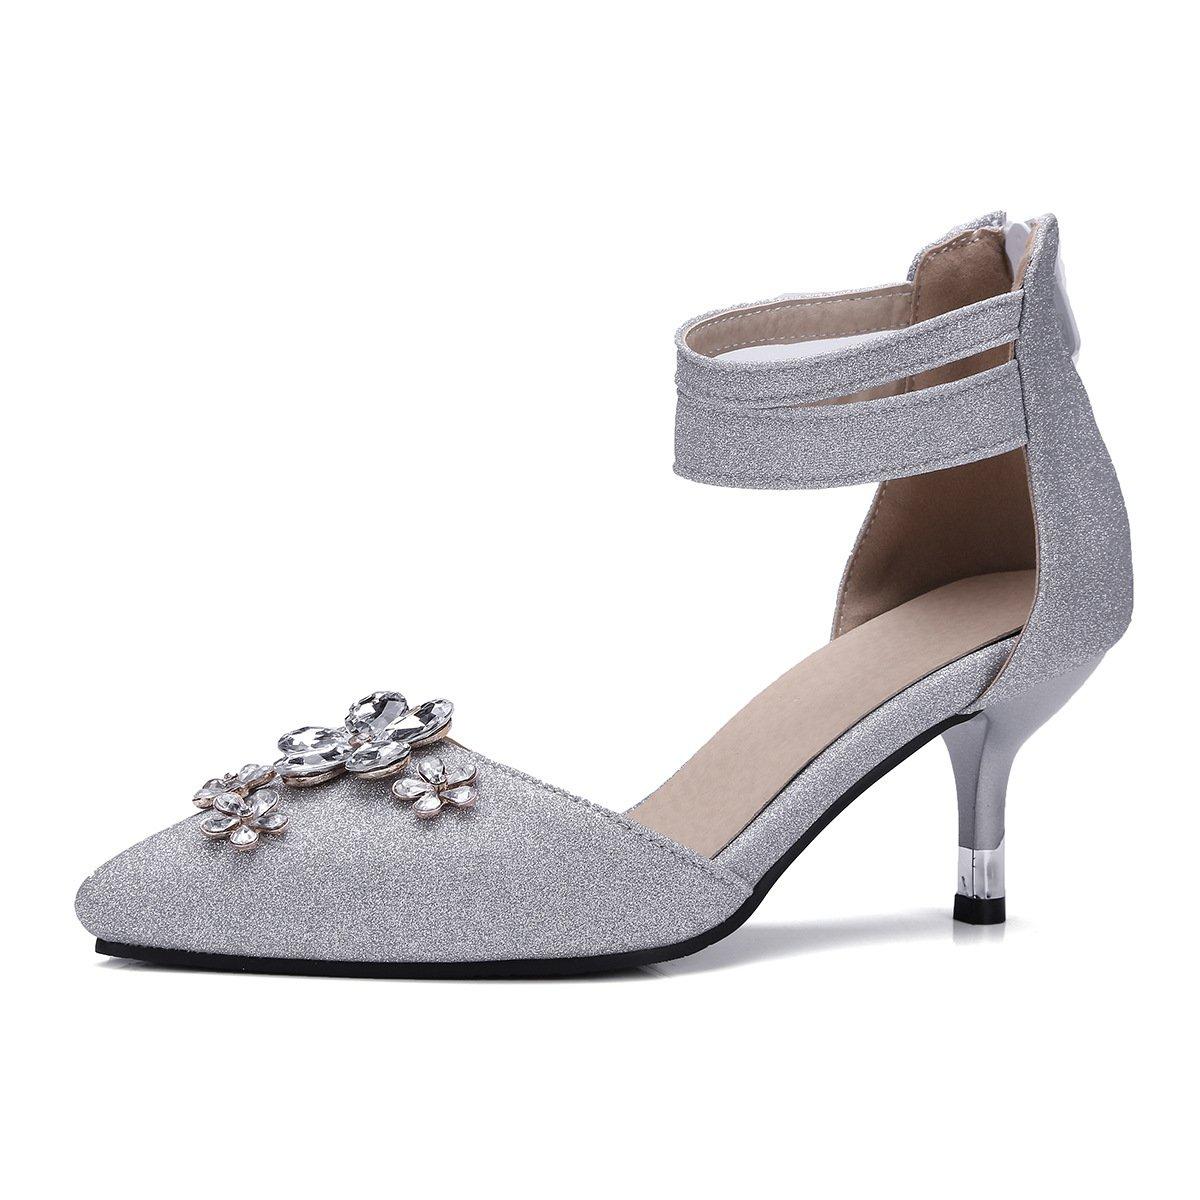 QIN&X Heels Frauen Spitze Zehe Stiletto Heels QIN&X Sandalen Silver 09e954